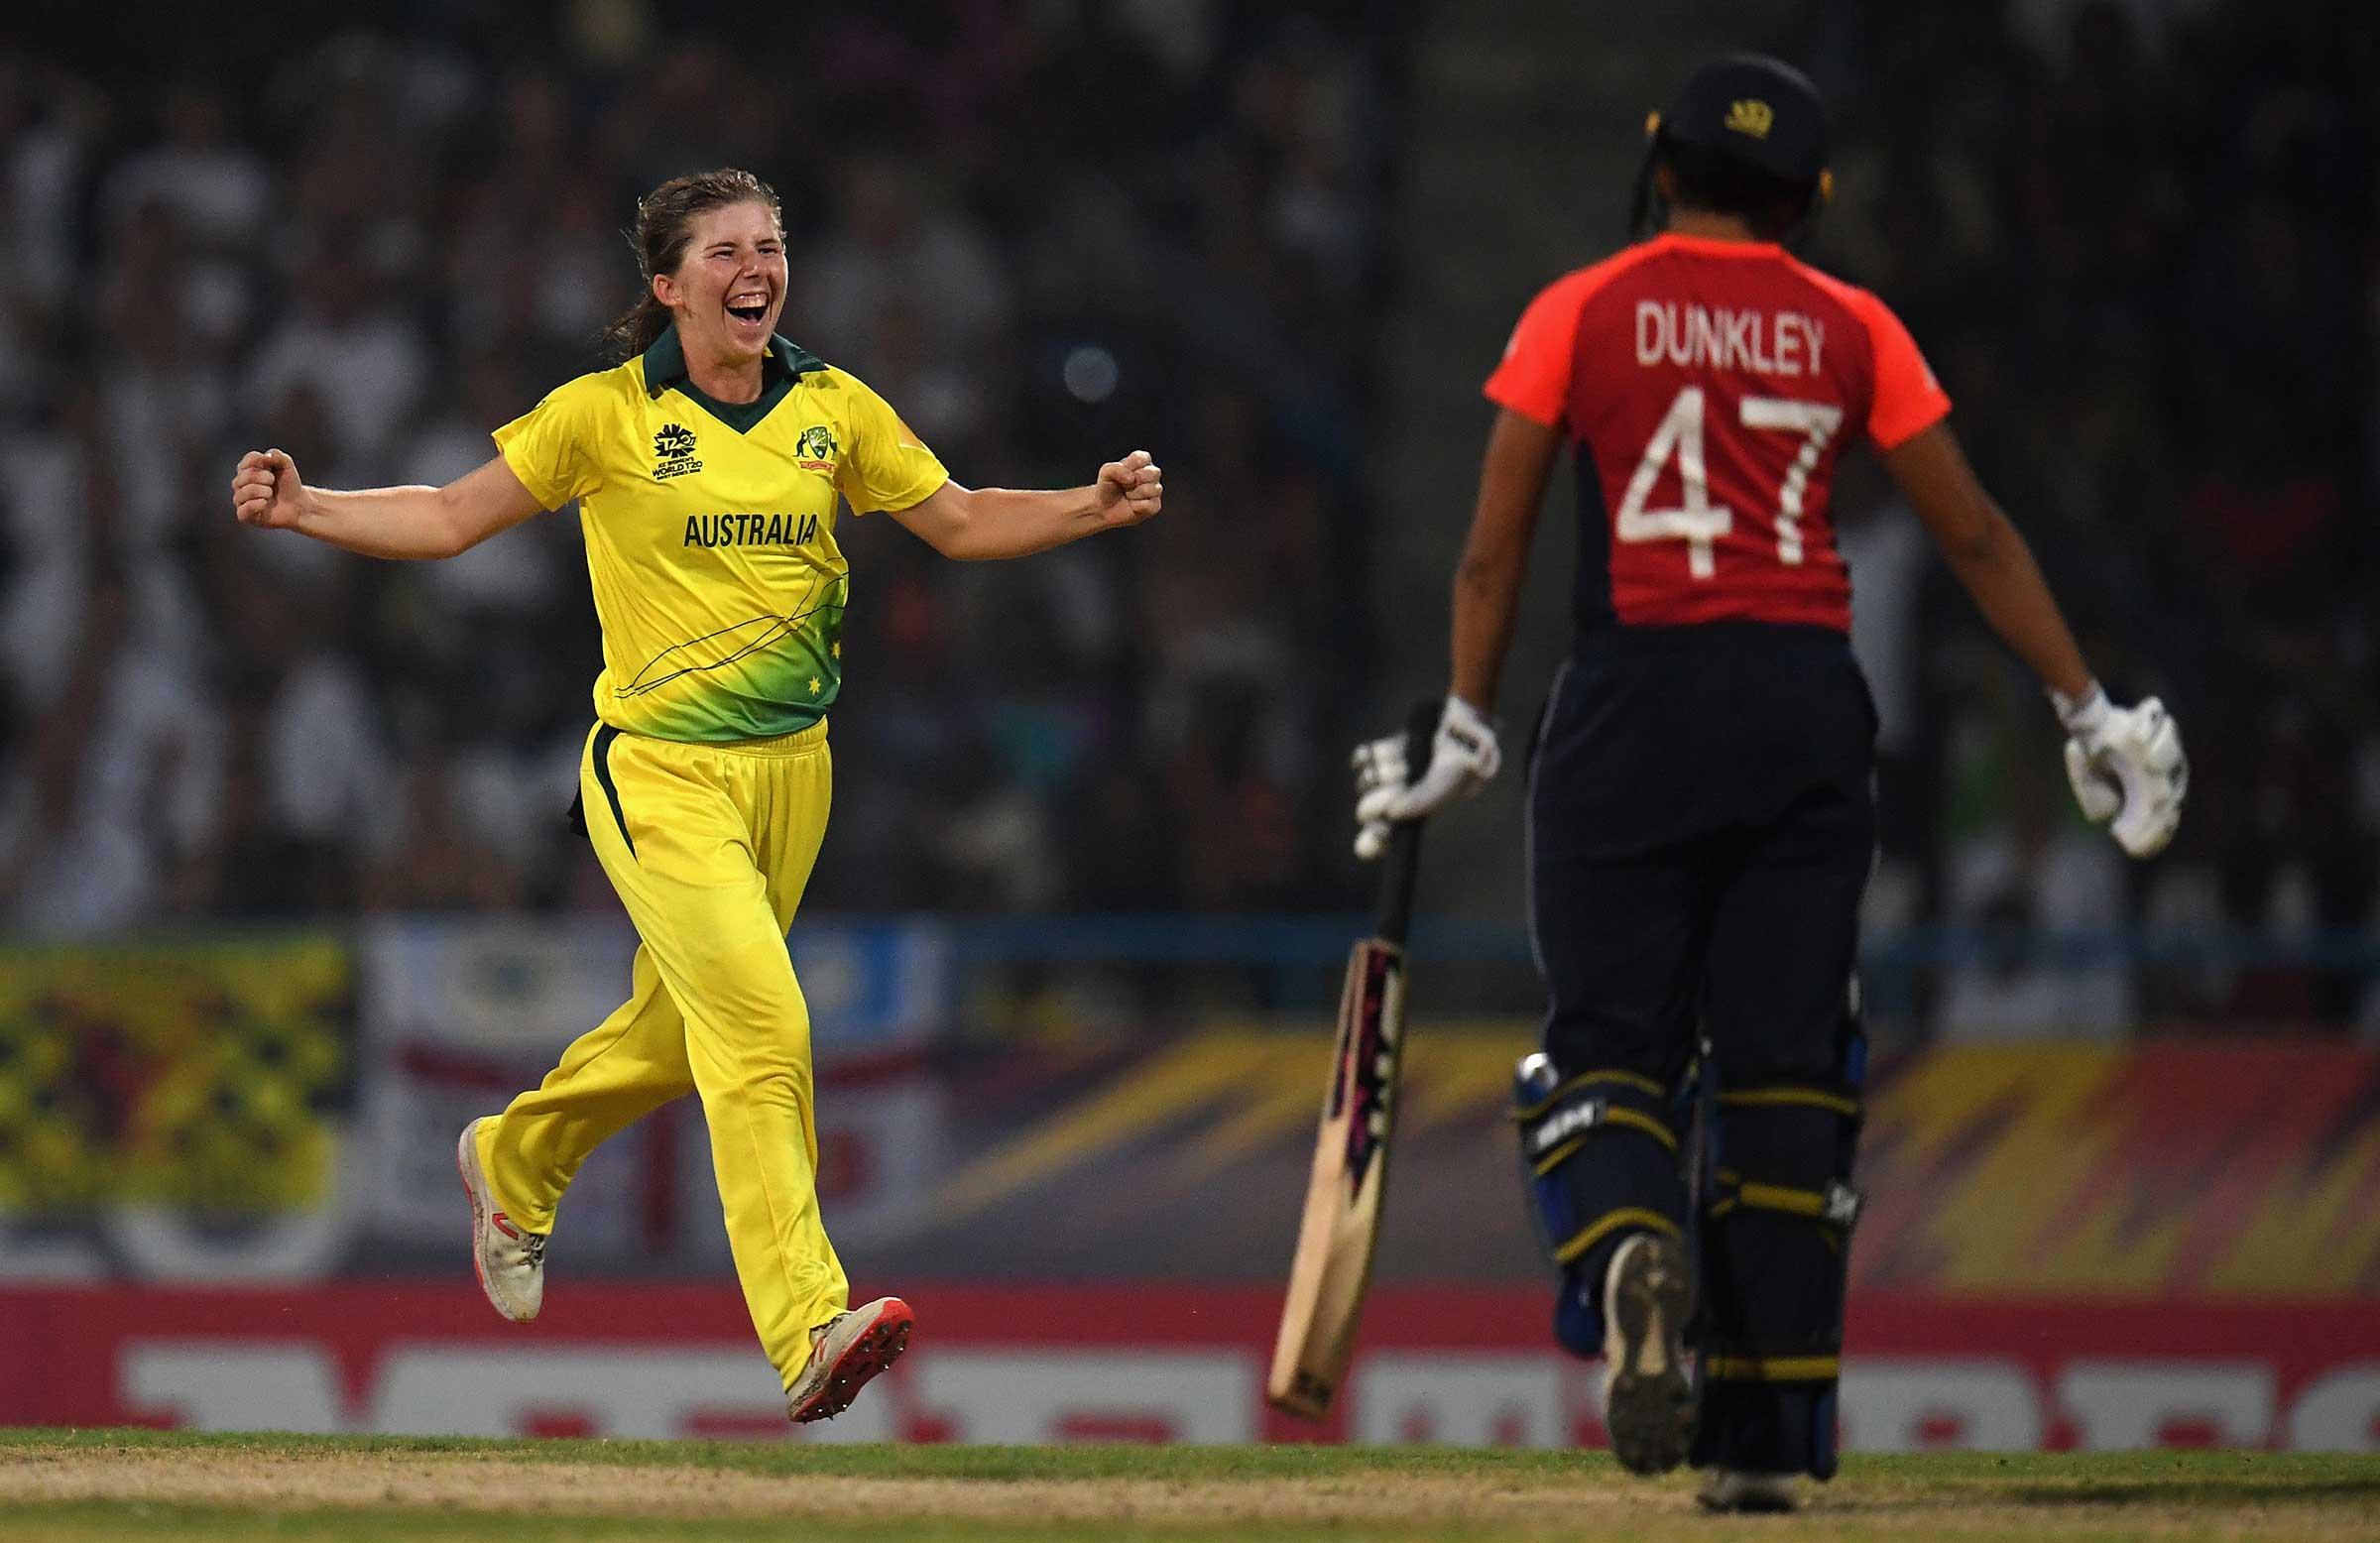 Wareham celebrates her second wicket // Getty